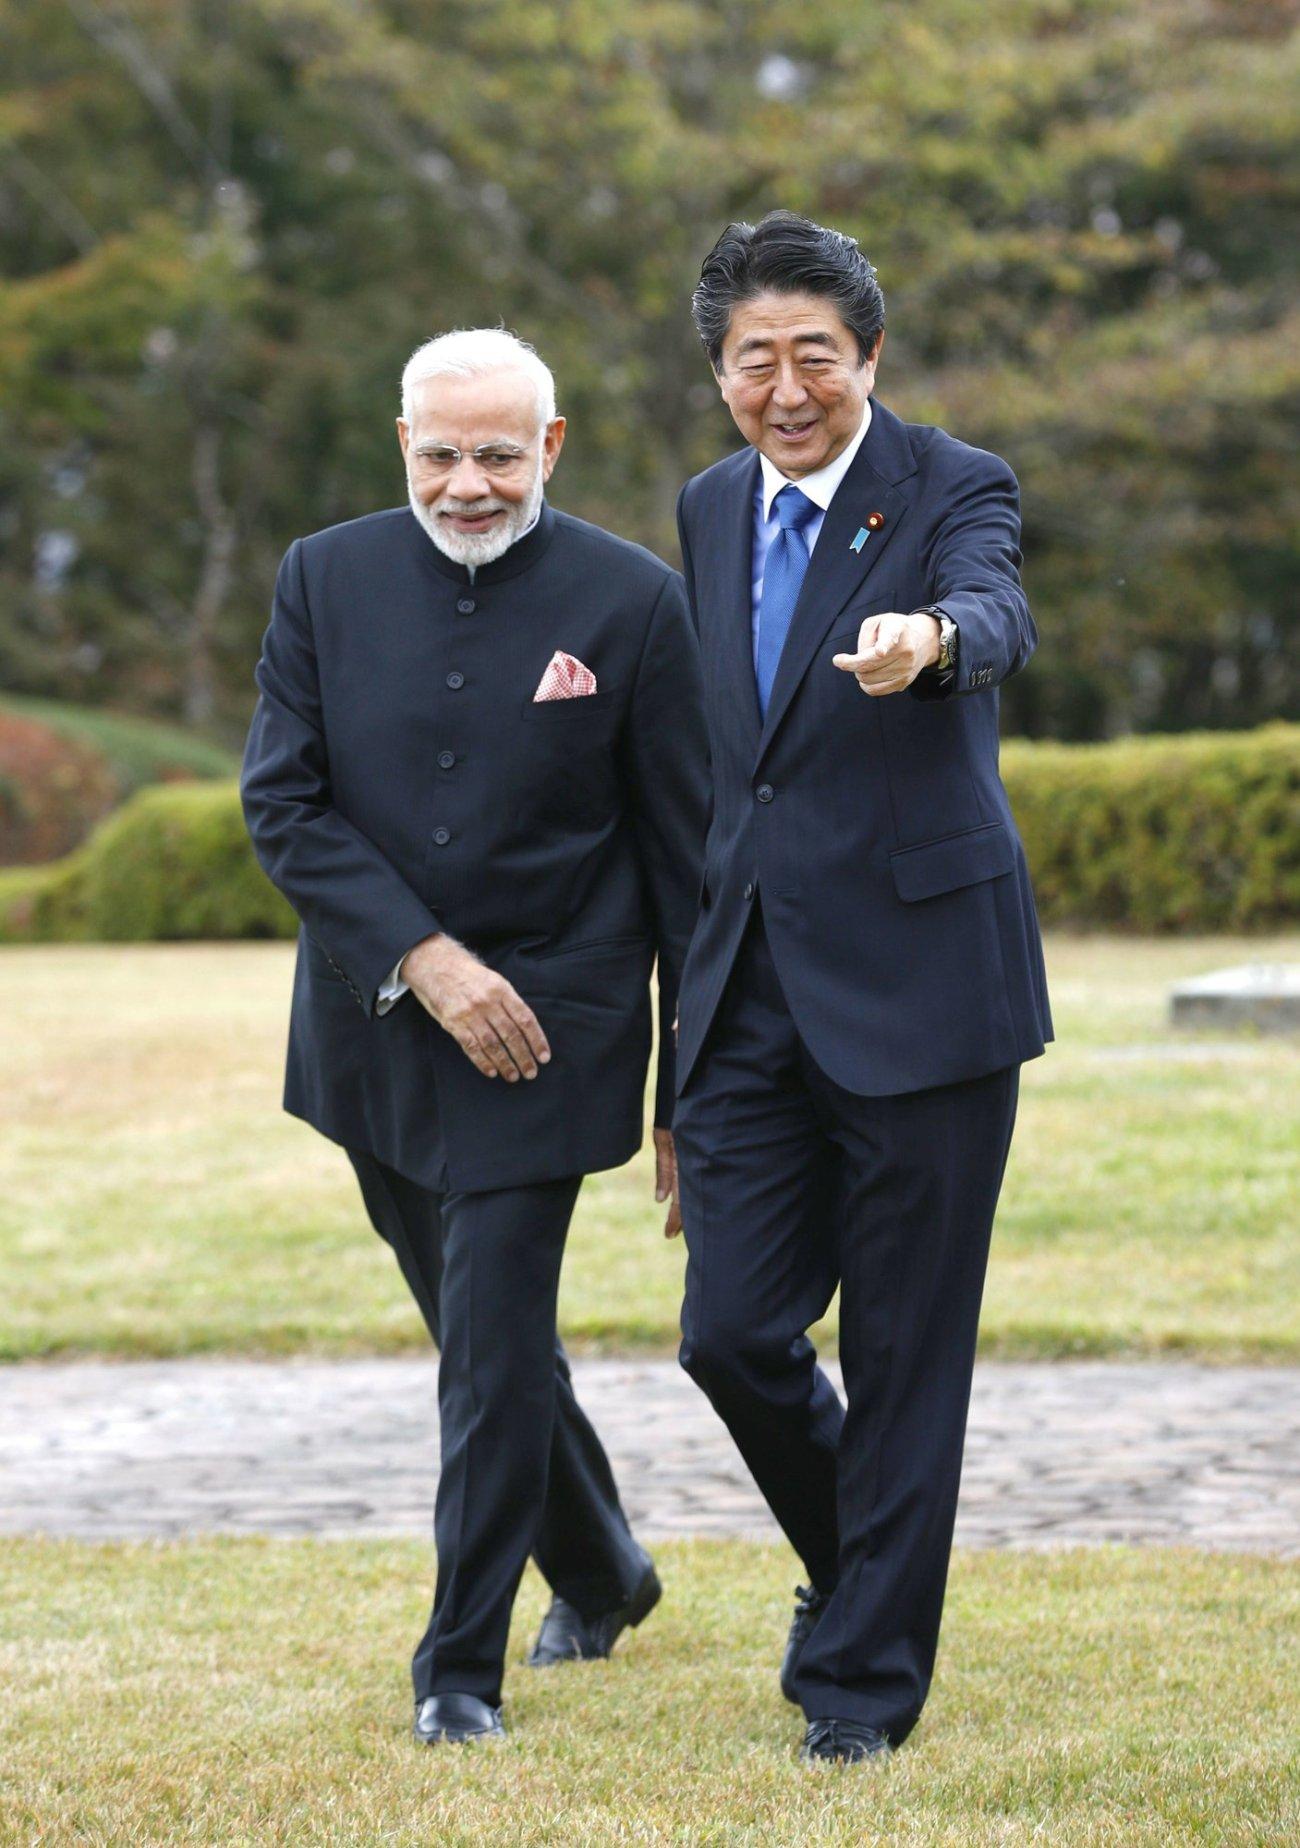 India's Prime Minister Narender Modi and Japan's Prime Minister Shinzo Abe together at Hotel garden, Yamanakako village-AP